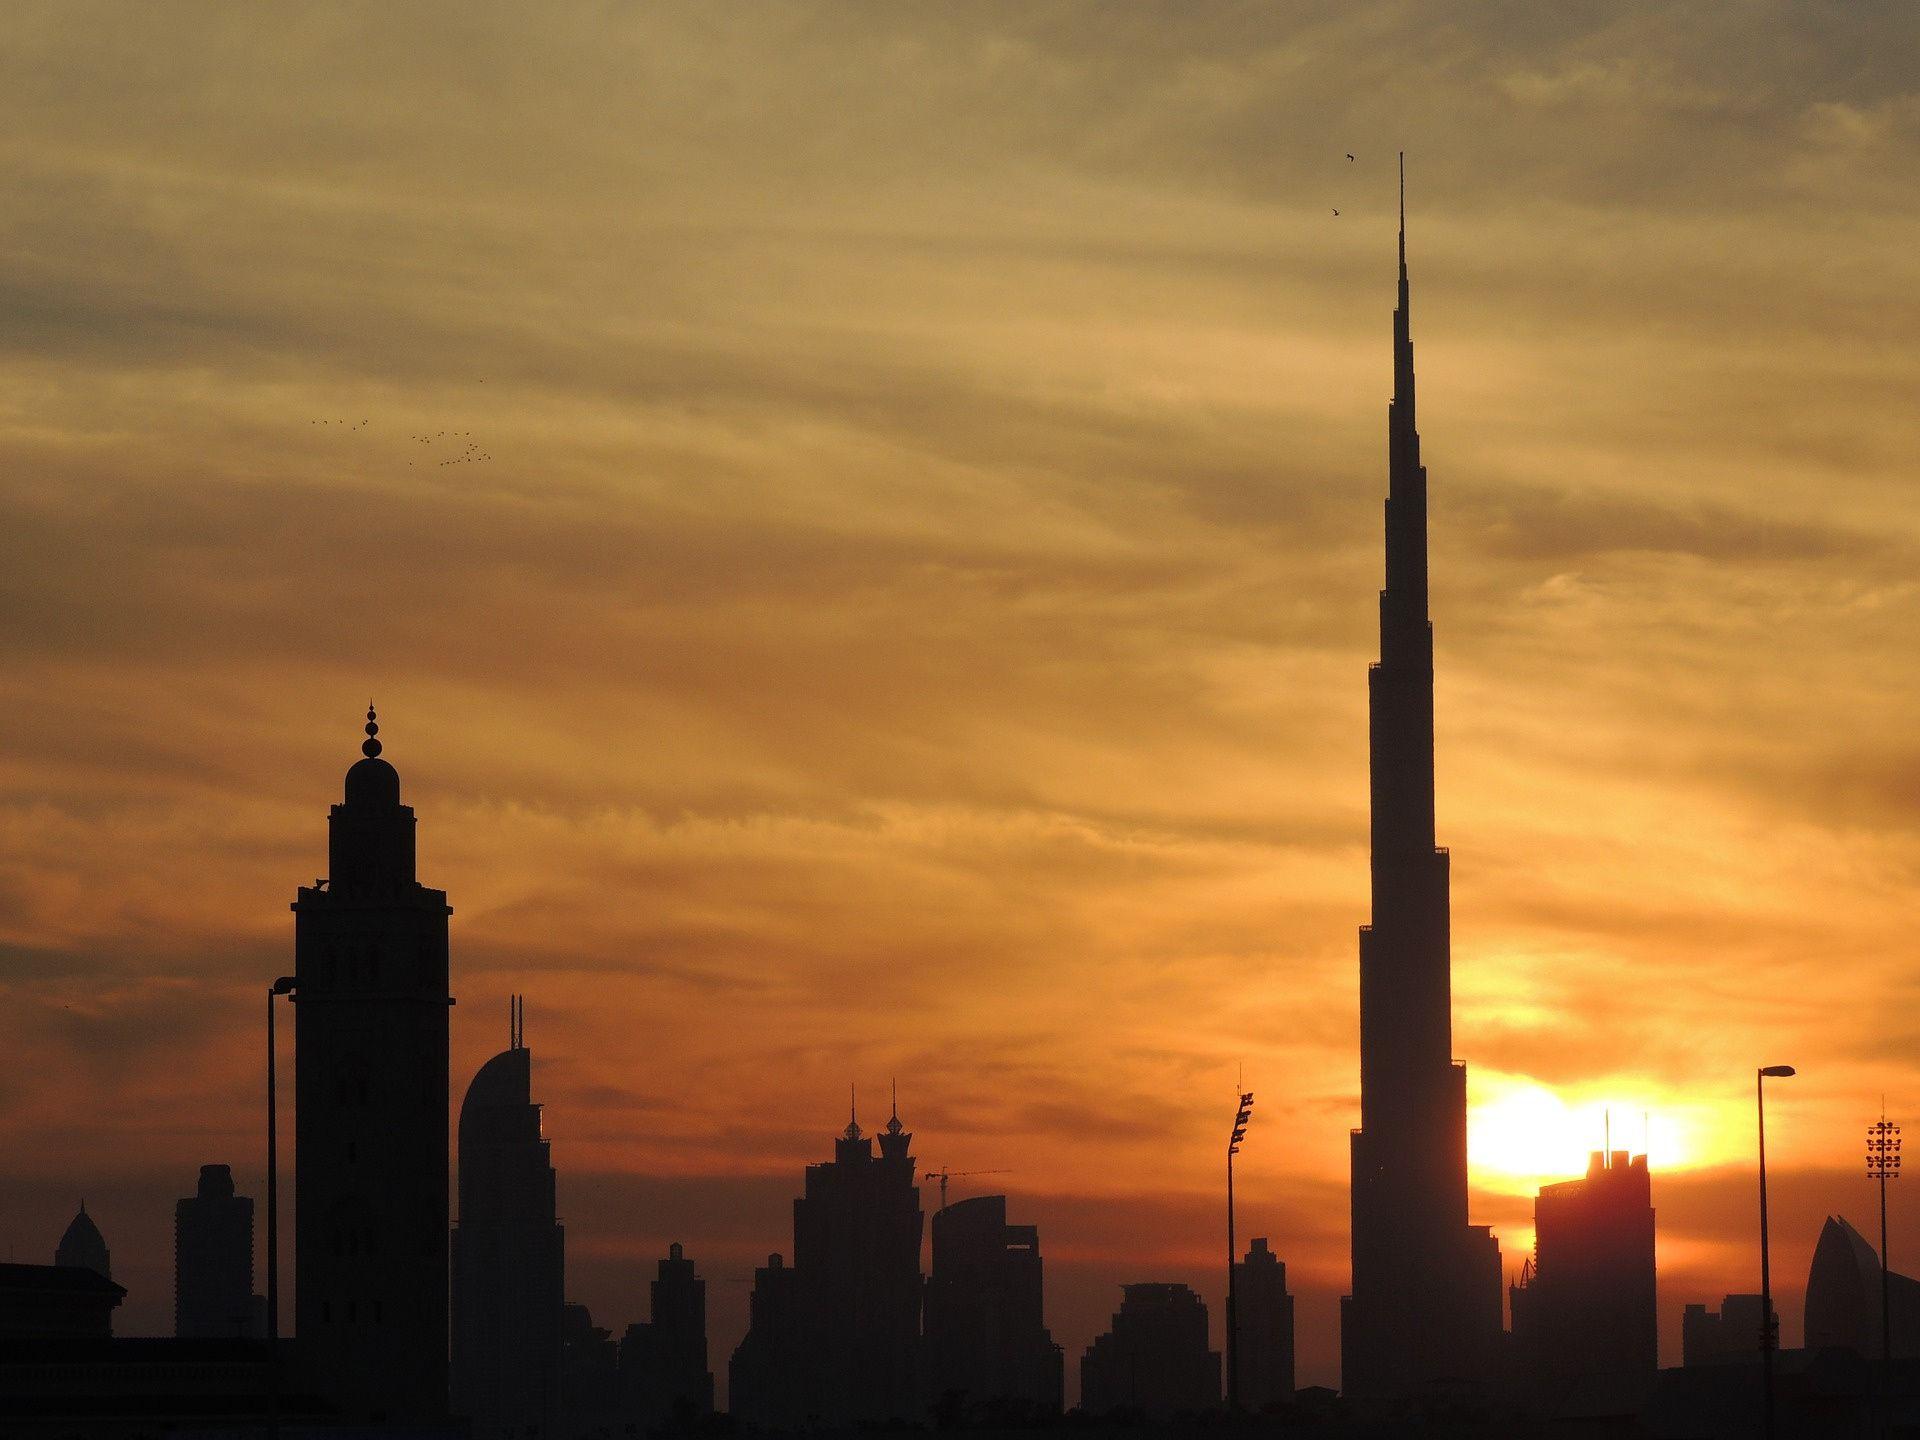 Evening View of Burj Khalifa